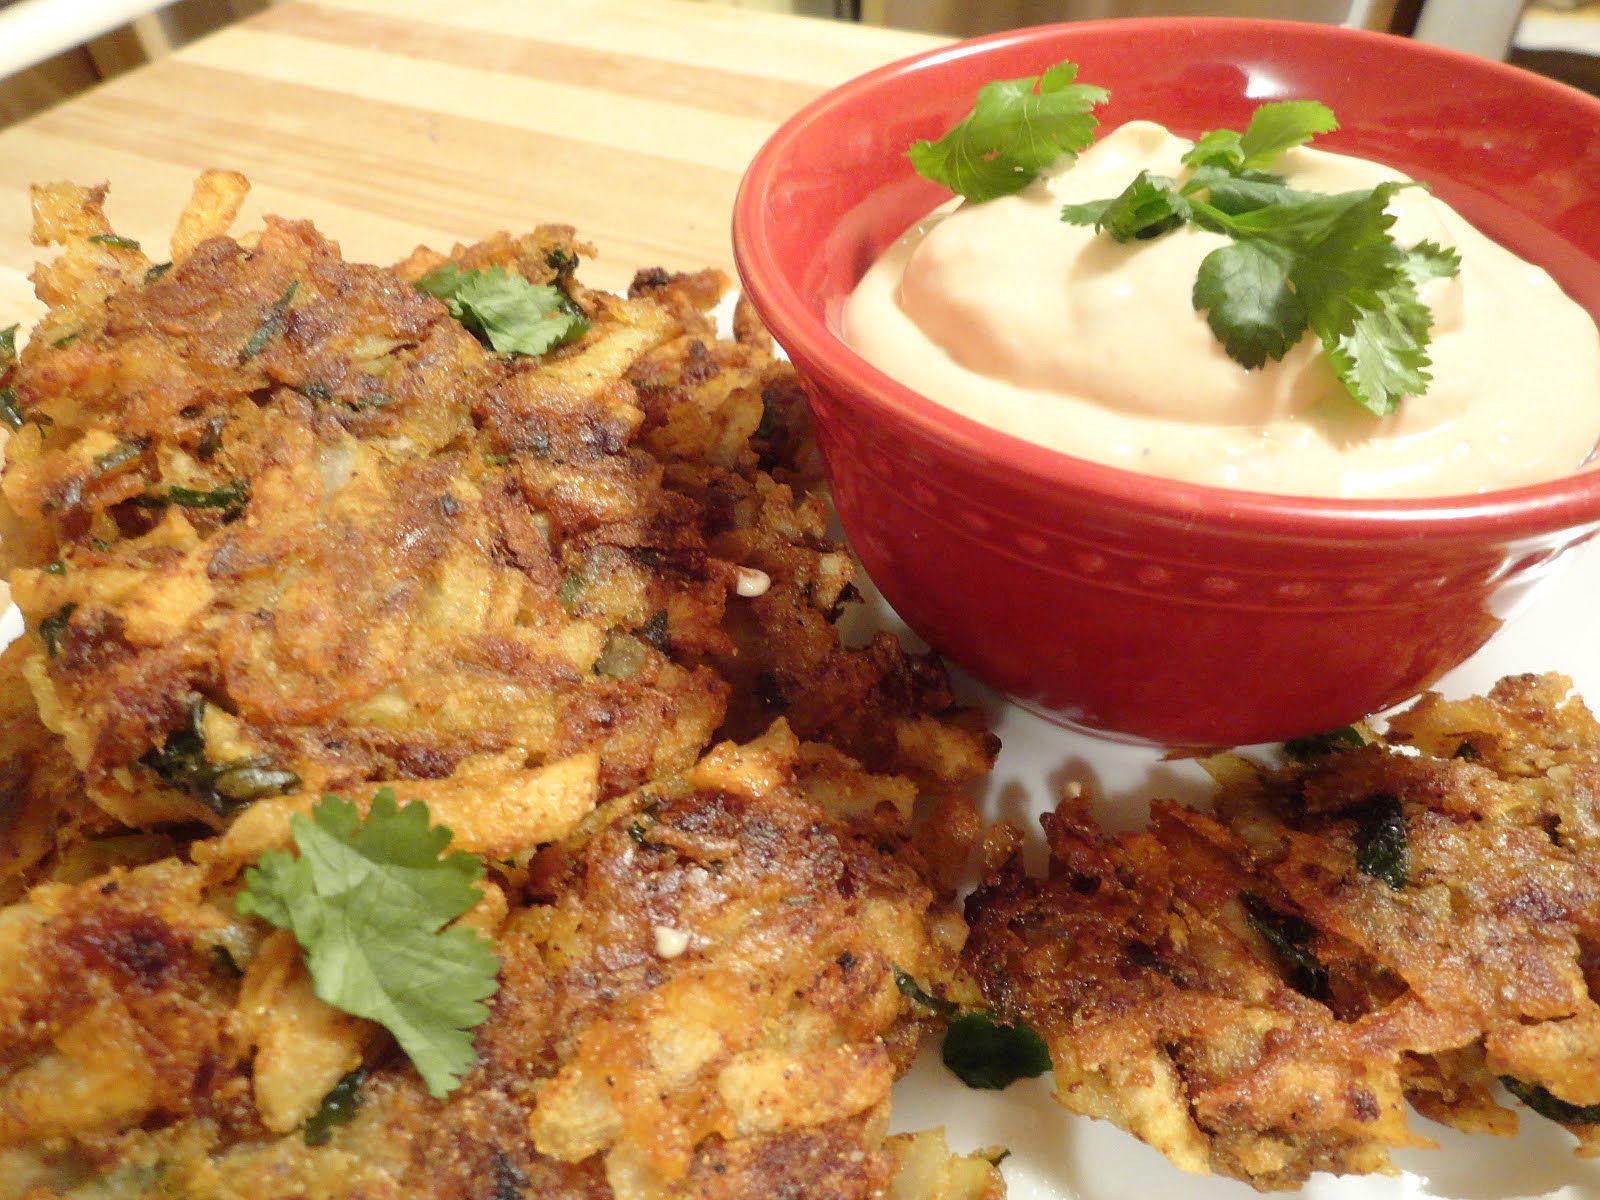 Spanish Potato Latkes with Chipotle Sour Cream